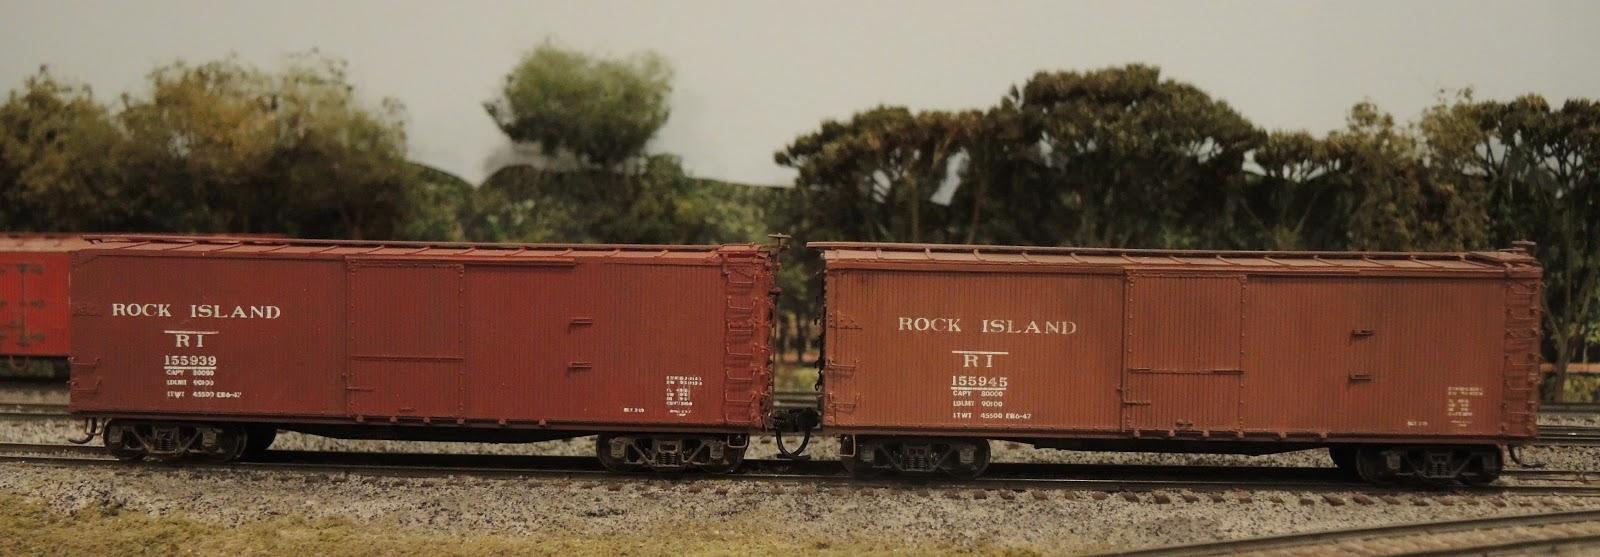 Minneapolis Amp Northland Railroad Company Modeling Rock